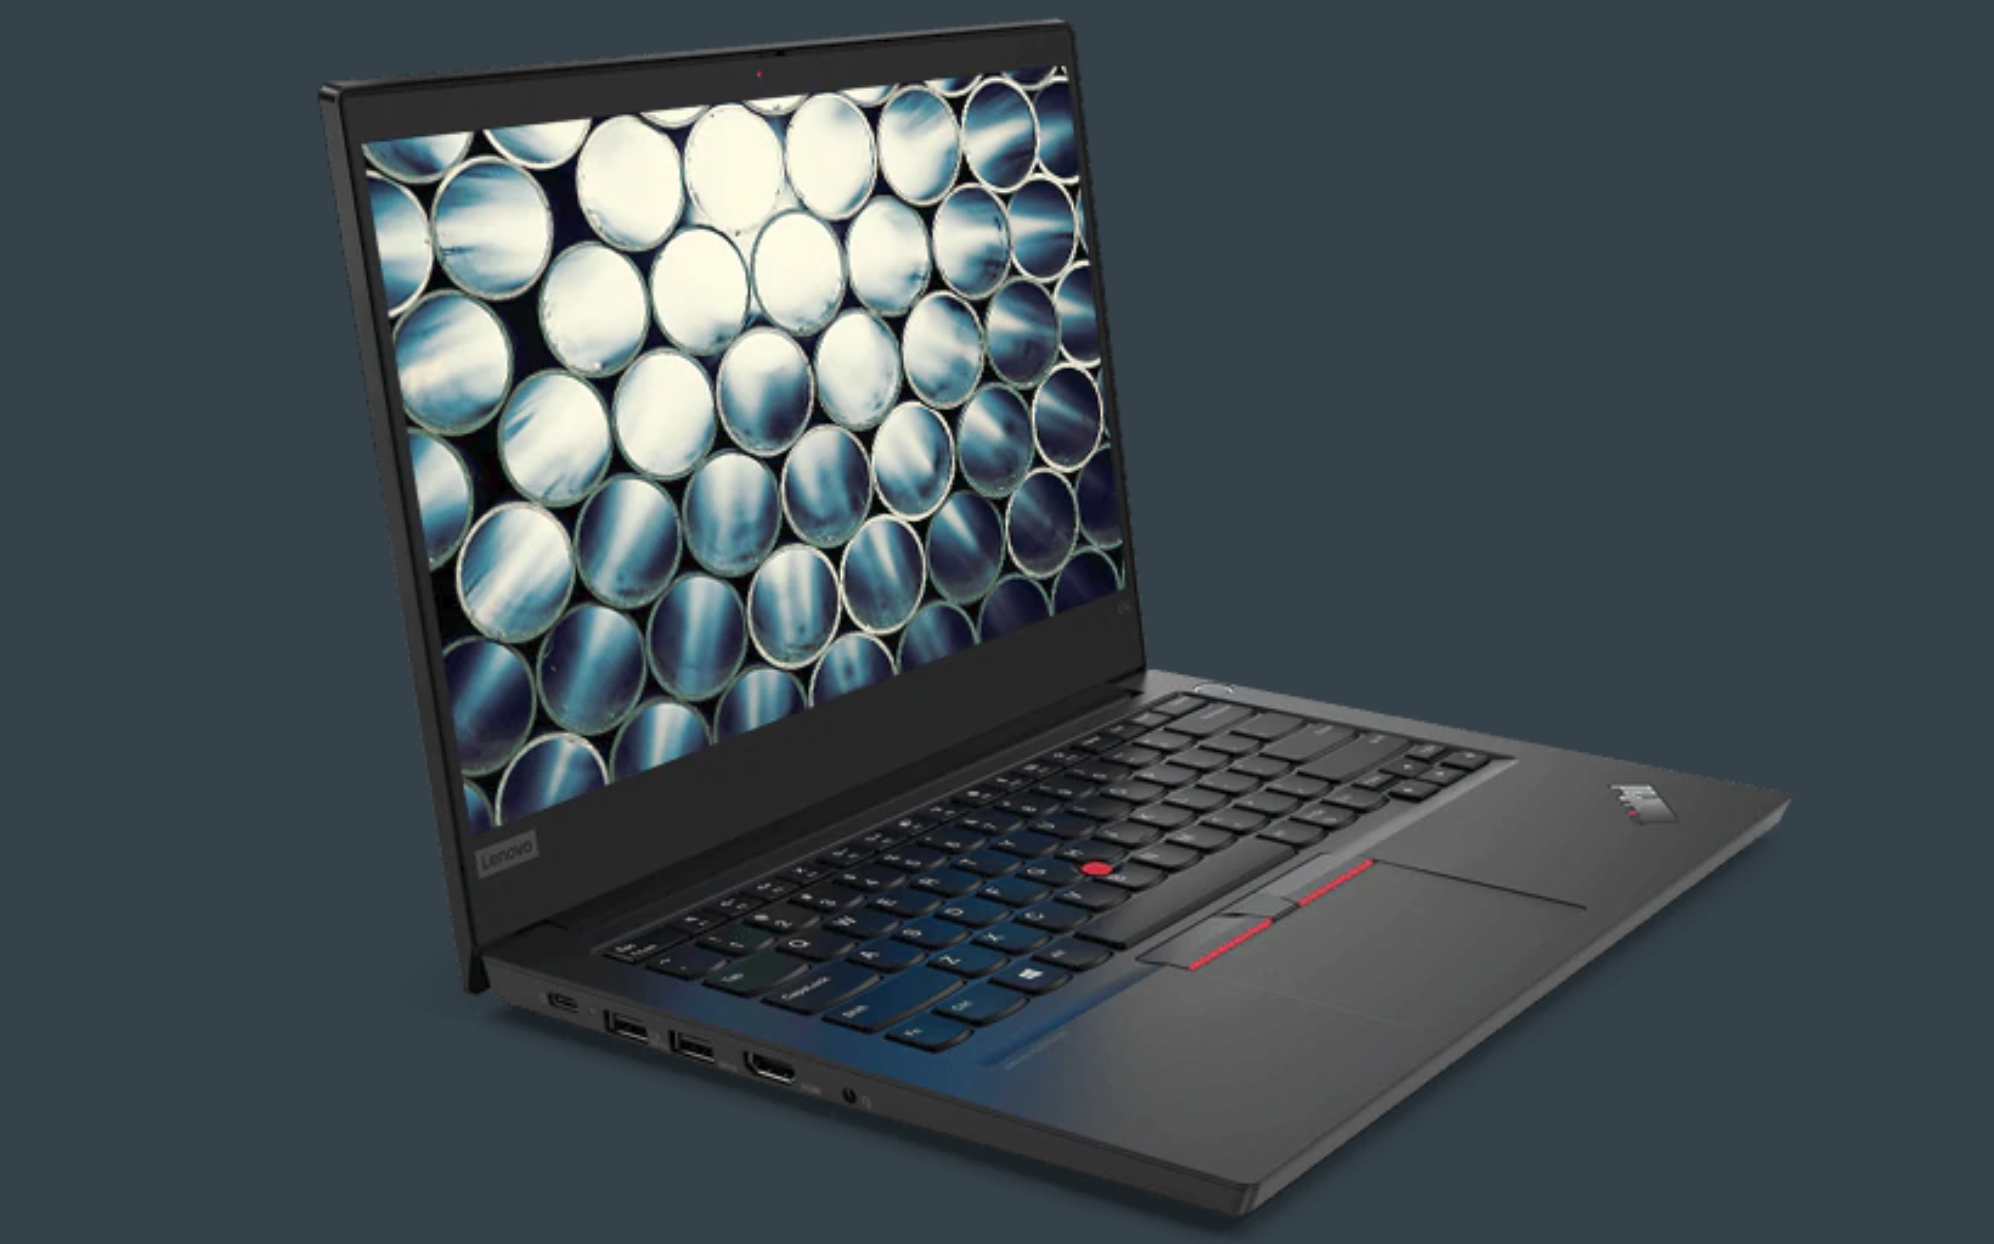 Lenovo ThinkPad E14 laptop do fotografii